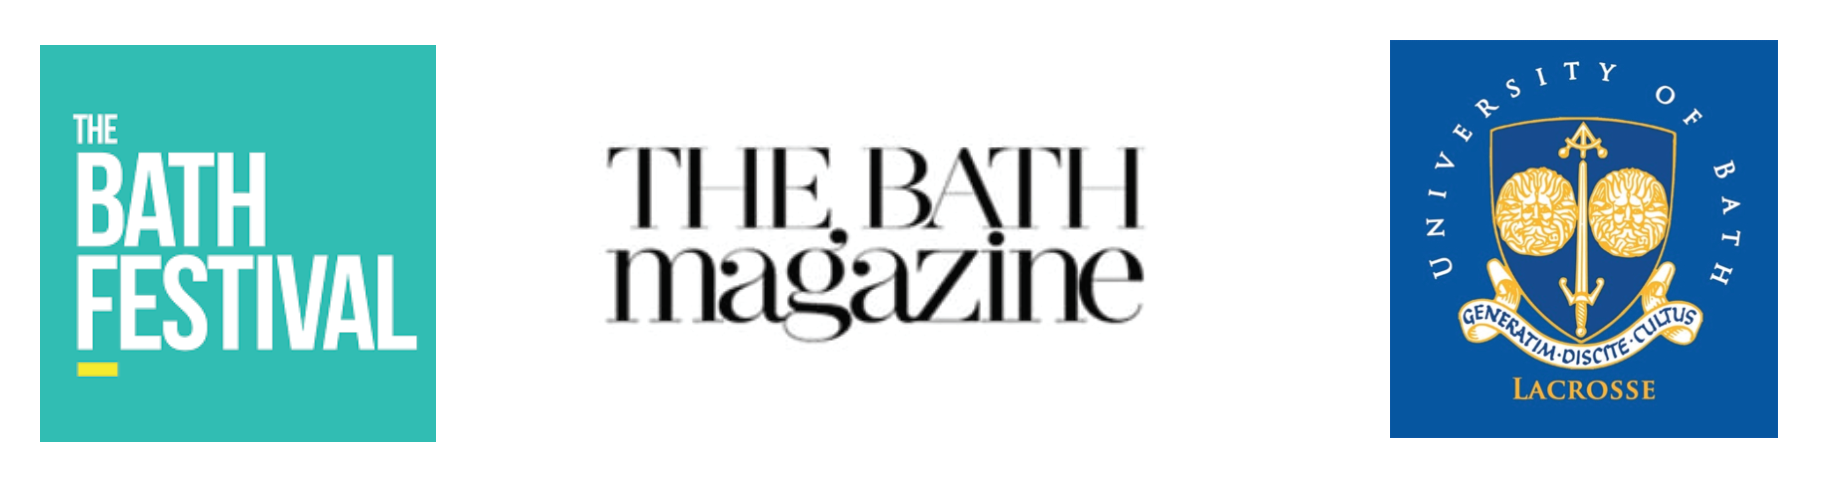 bath-pizza-co-restaurant-partners-001.jpg